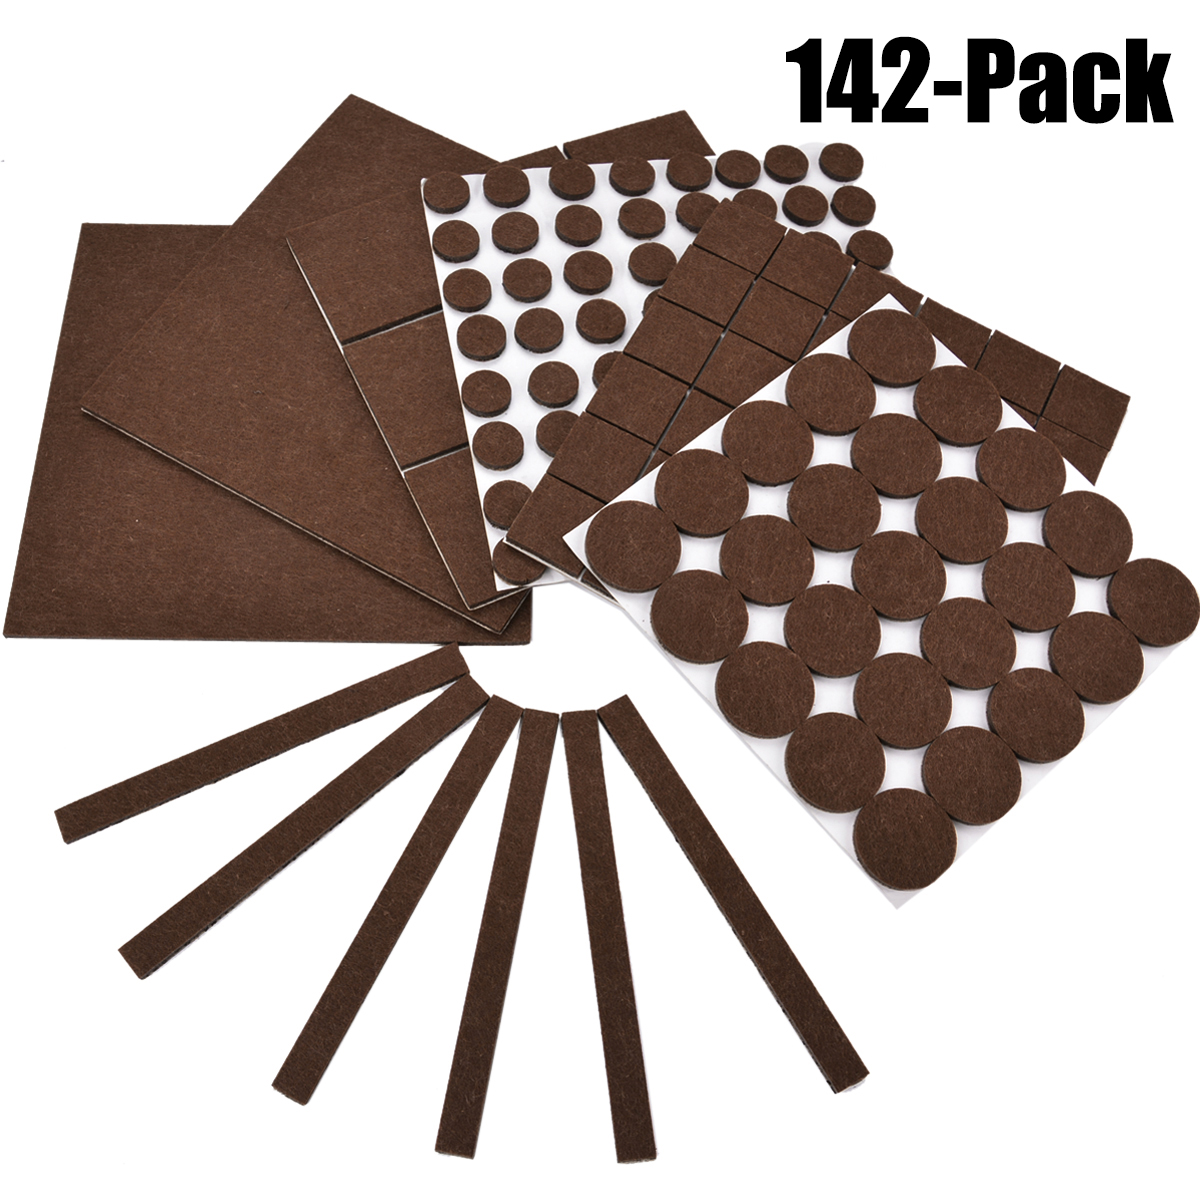 142Pcs Furniture Pads,  Outgeek  Felt Floor Protectors Assorted Size Furniture Pads for Table Desk Chair Legs